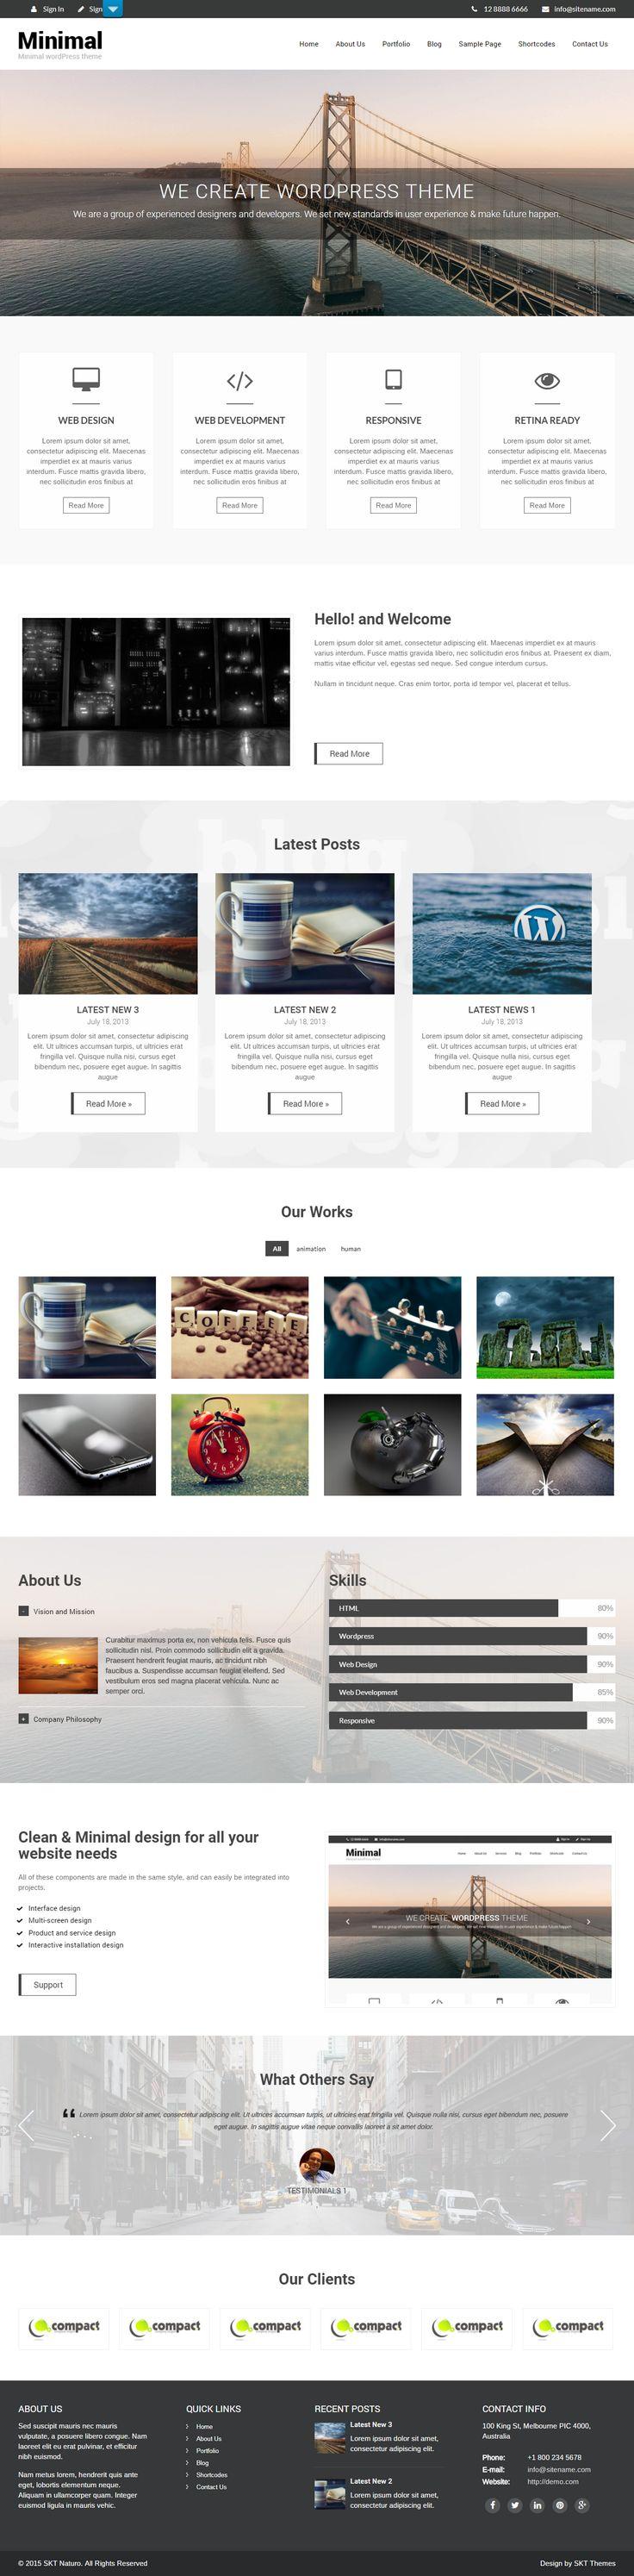 Free Minimalist WordPress Themes for Minimalist Style Websites